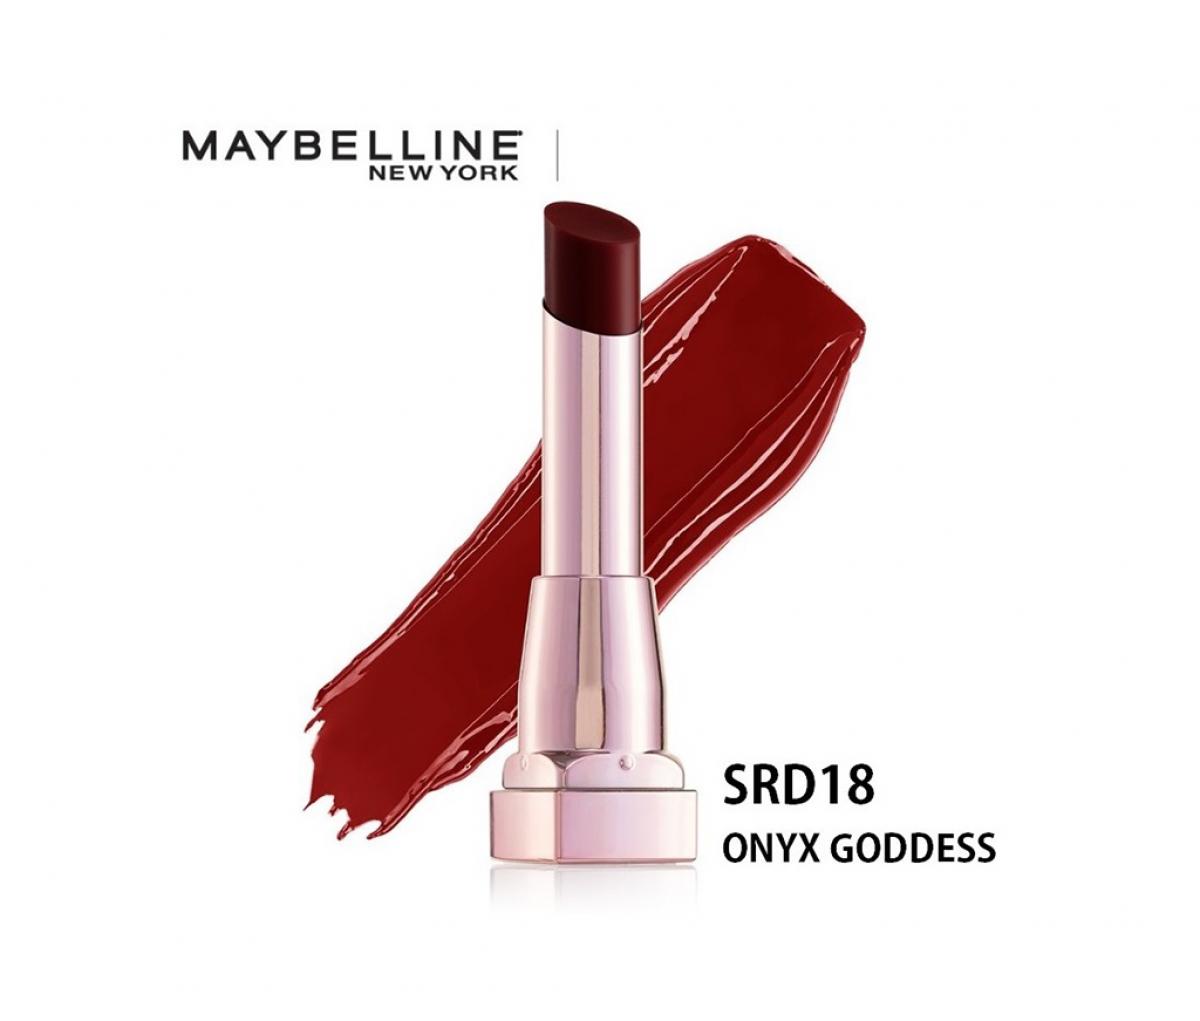 Maybelline shine compulsion srd18